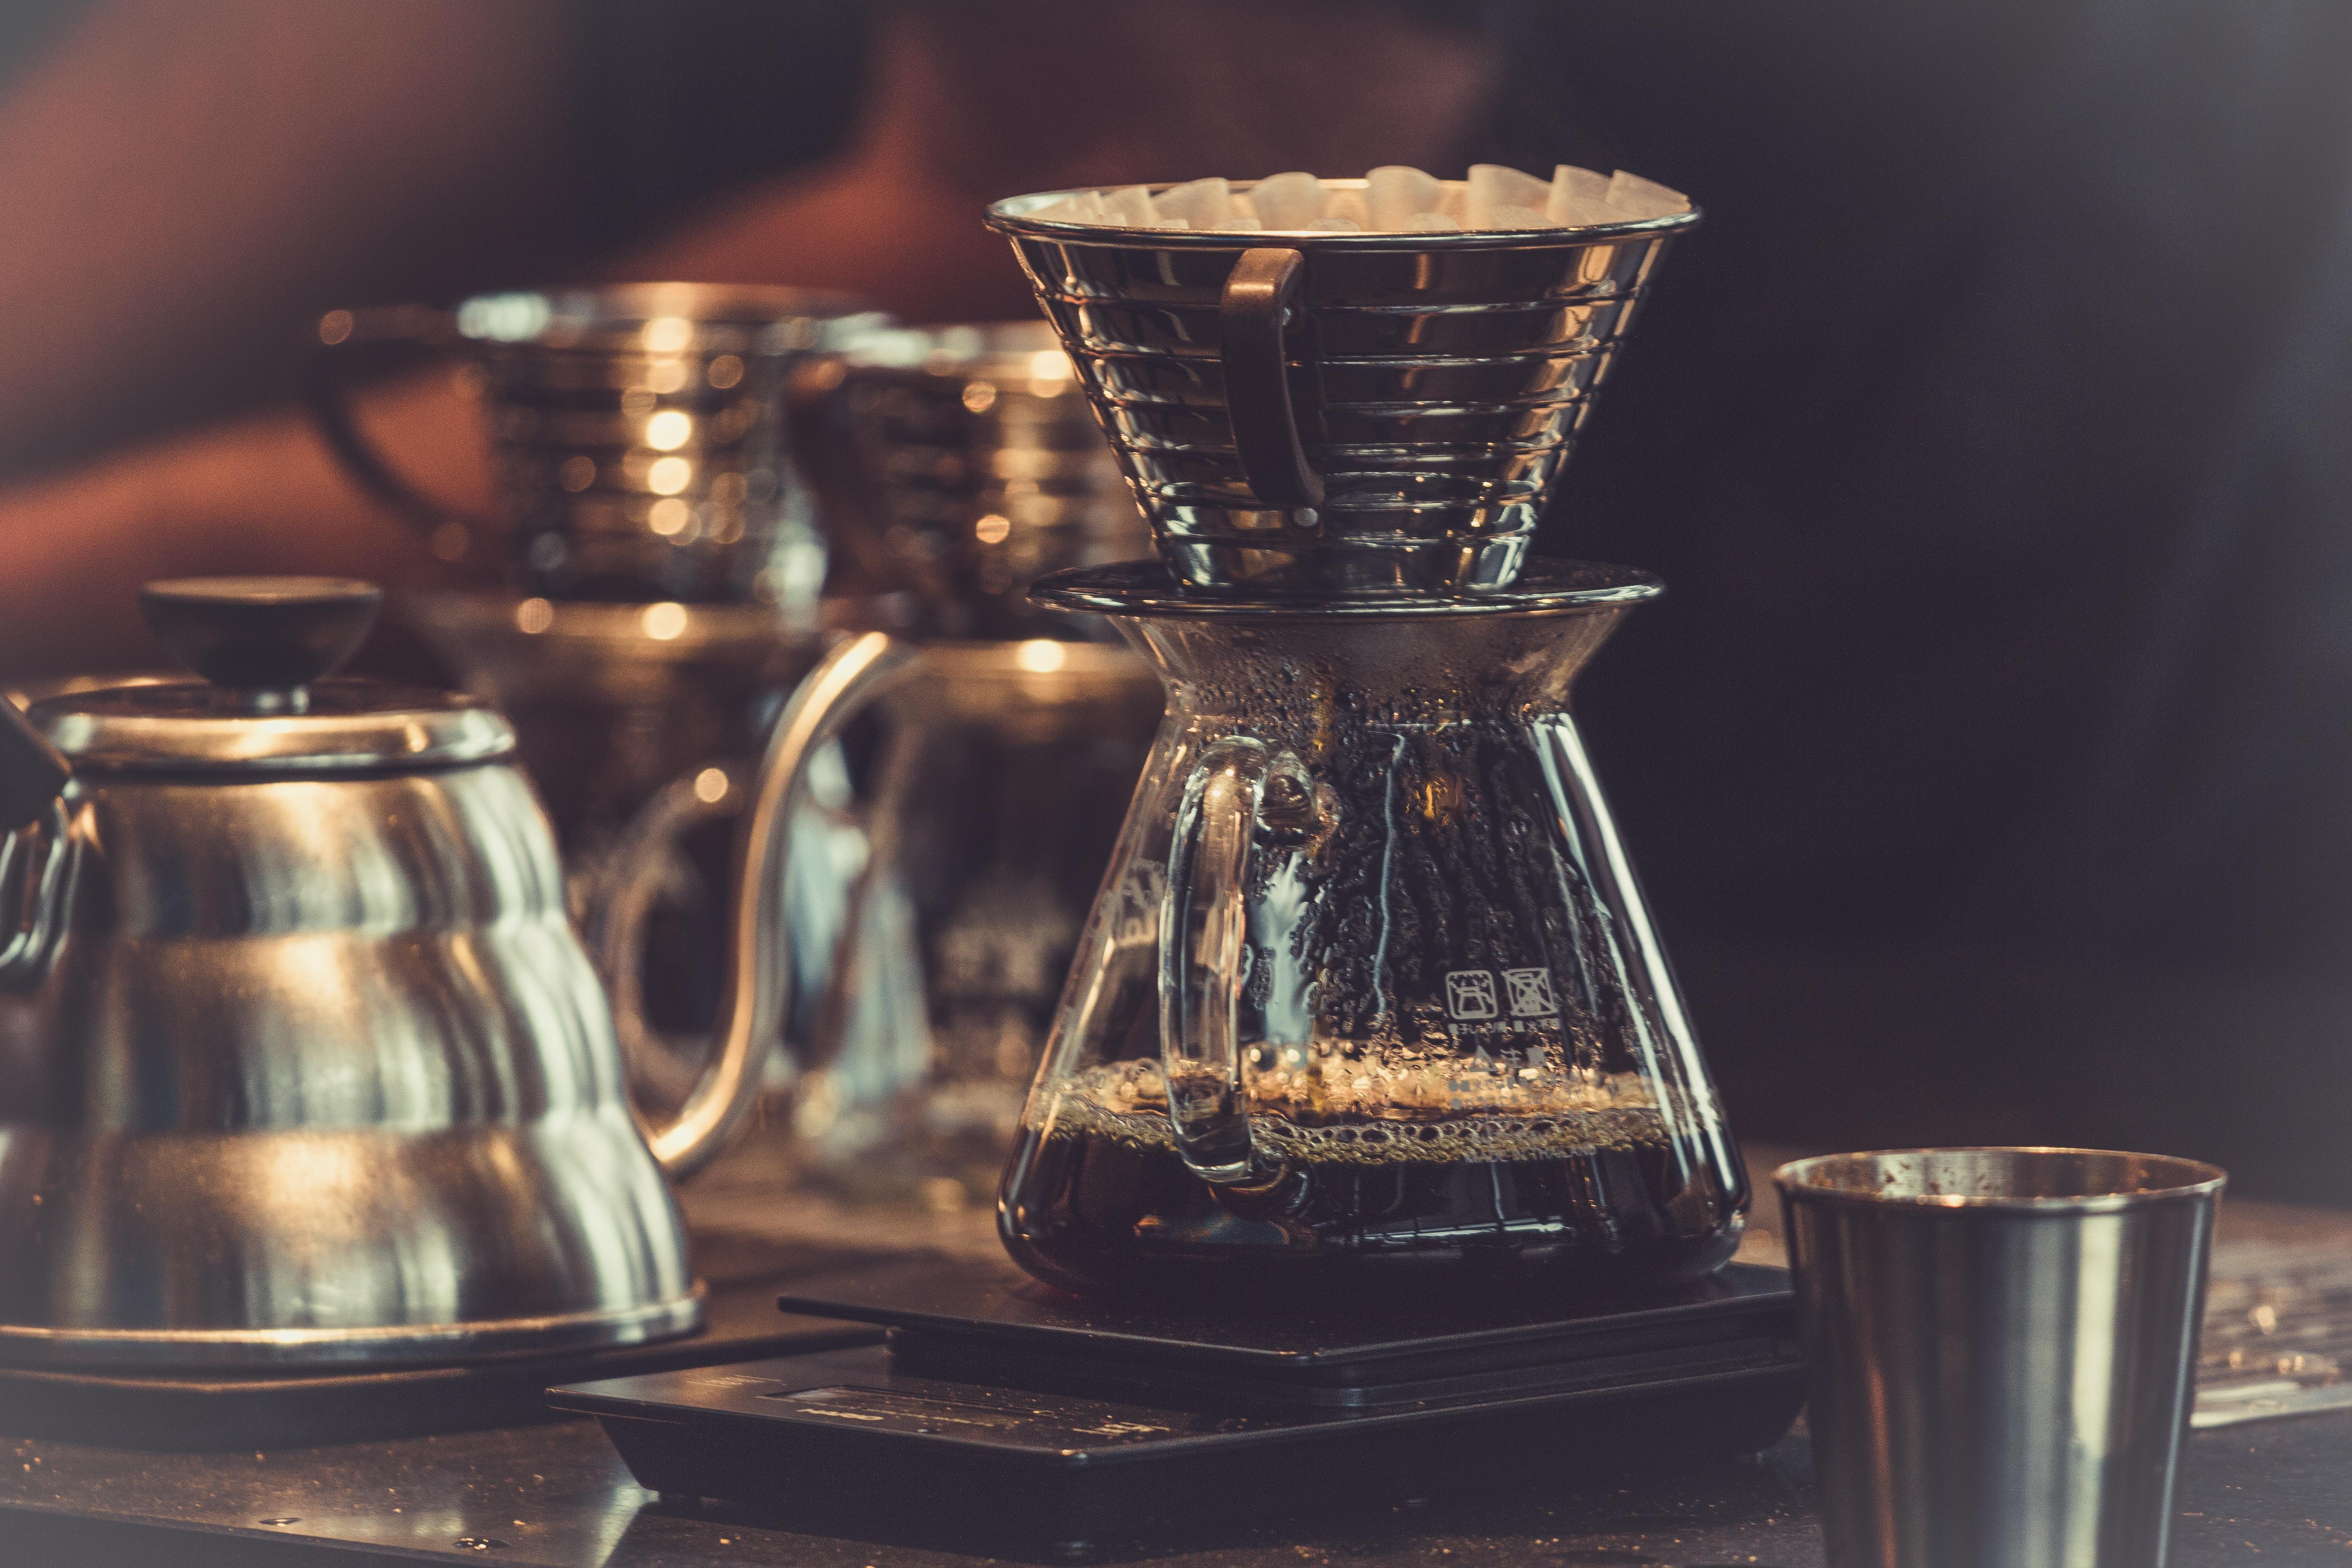 Filterkaffee der am kochen ist.